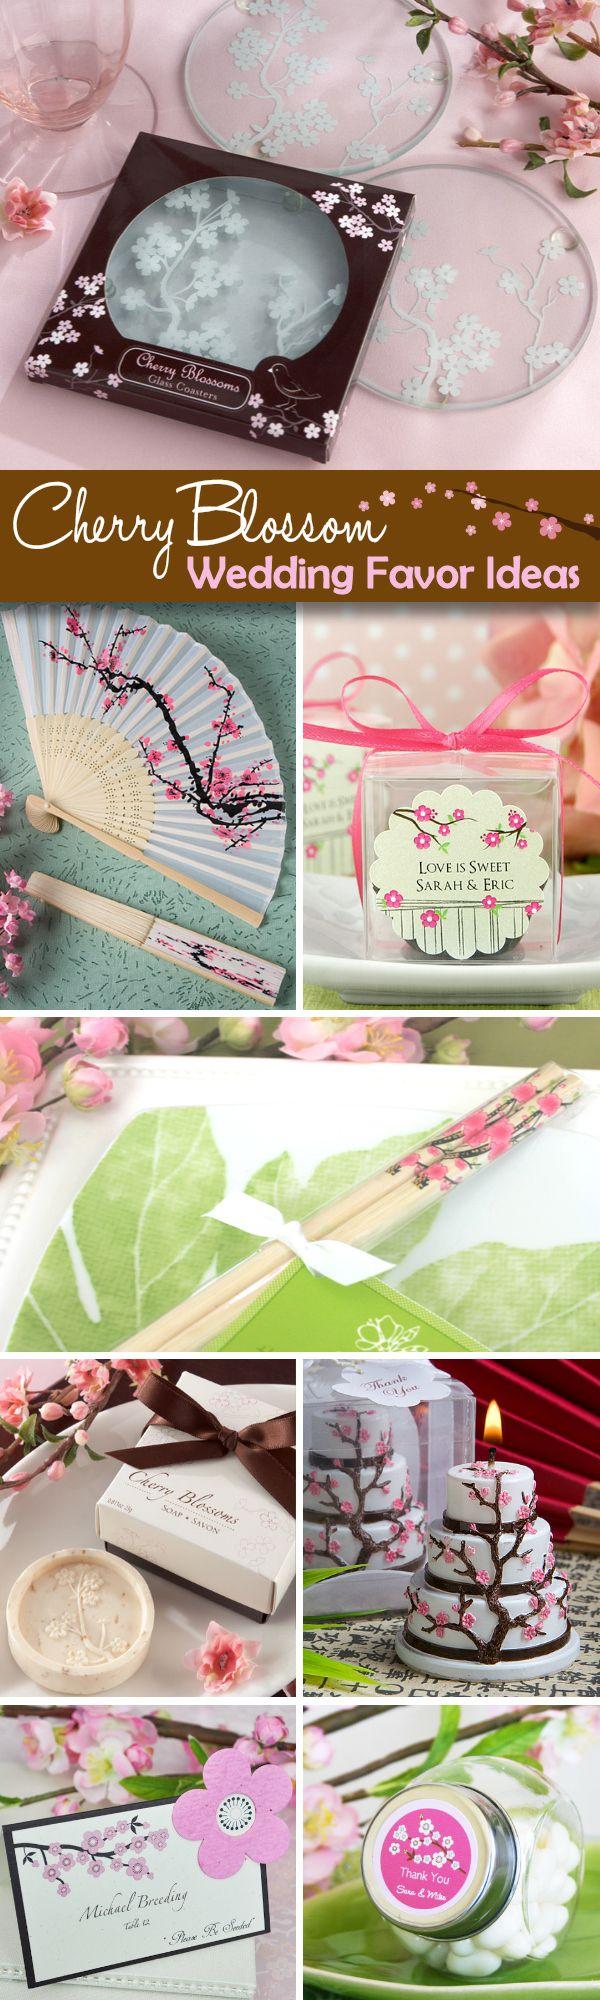 40 Gorgeous Cherry Blossom Wedding Favor Ideas